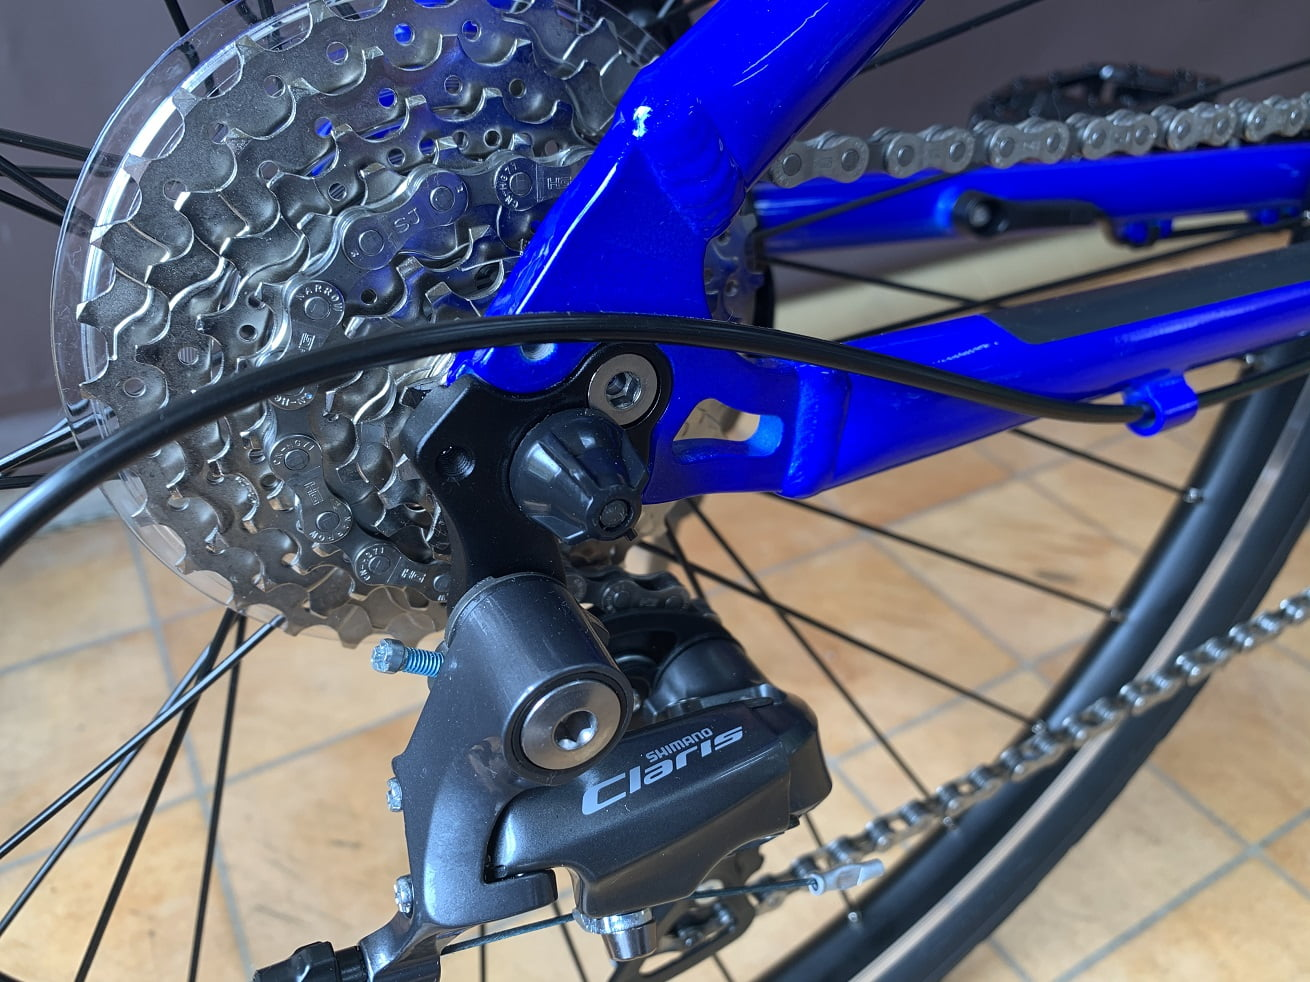 Panasonic電動アシスト自転車「ジェッター」8段変速ギア